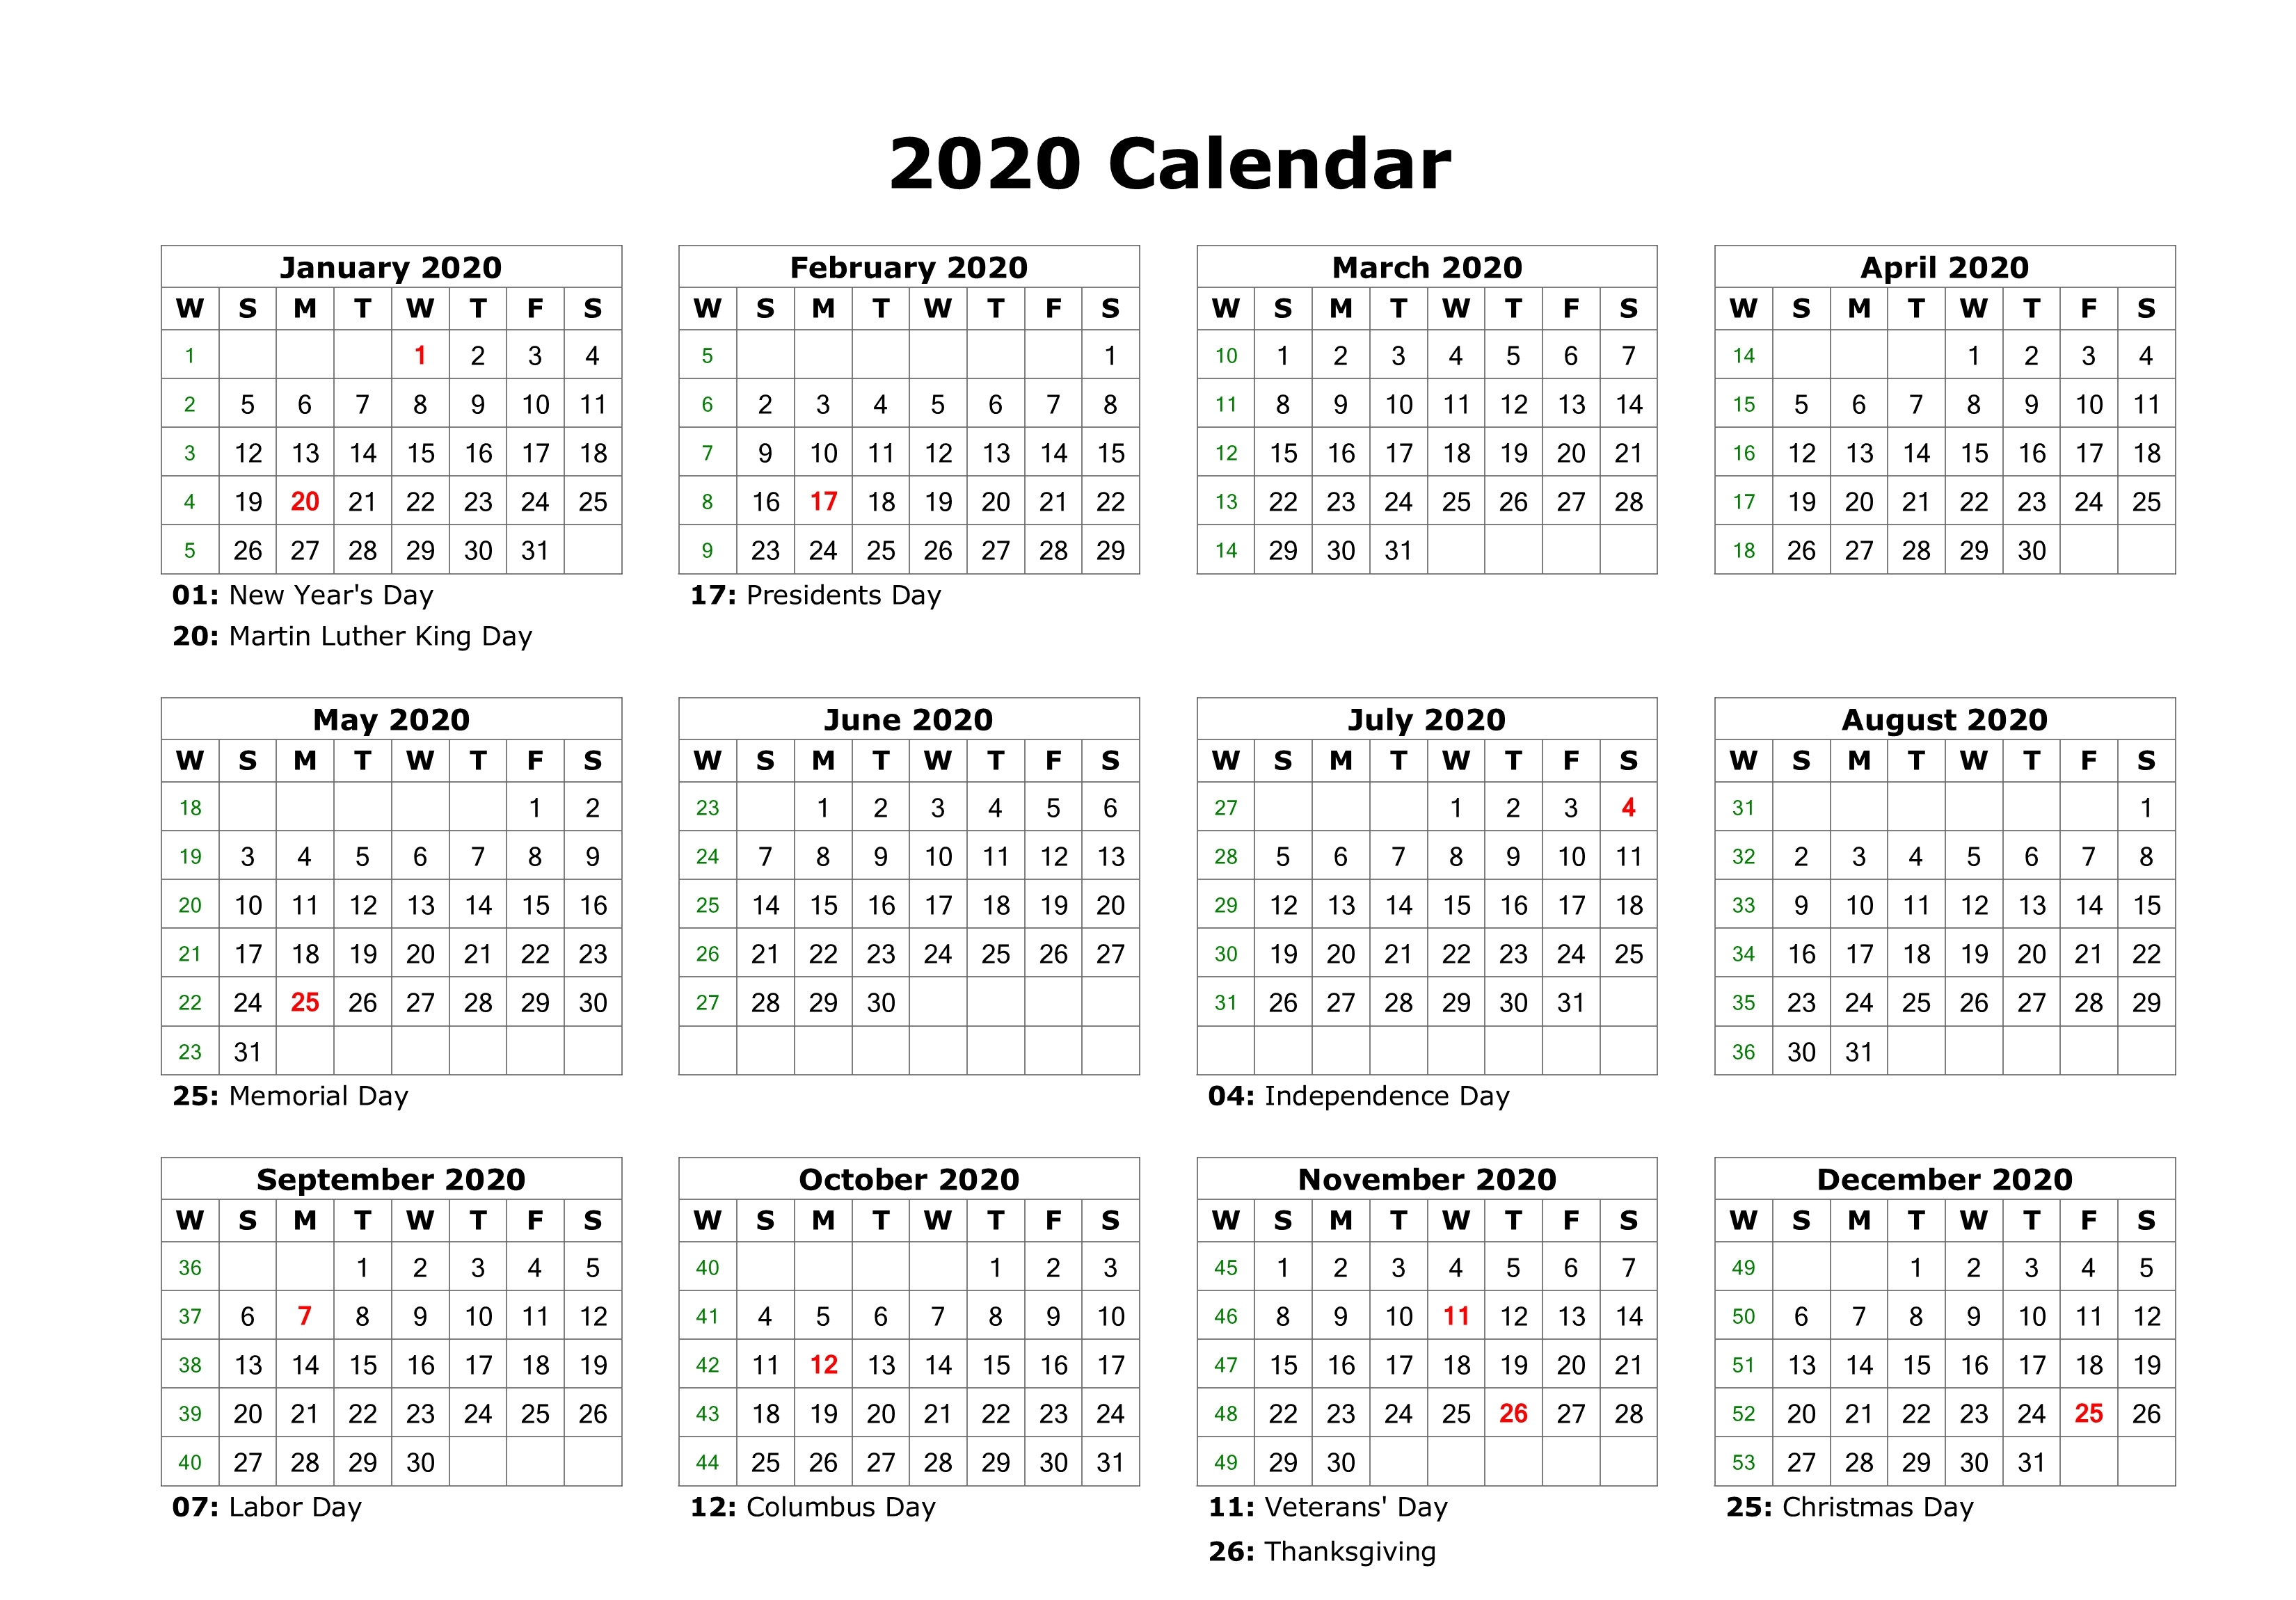 Free Editable 2020 Calendar Printable Template with regard to Free Printable 2020 Attendance Calendar